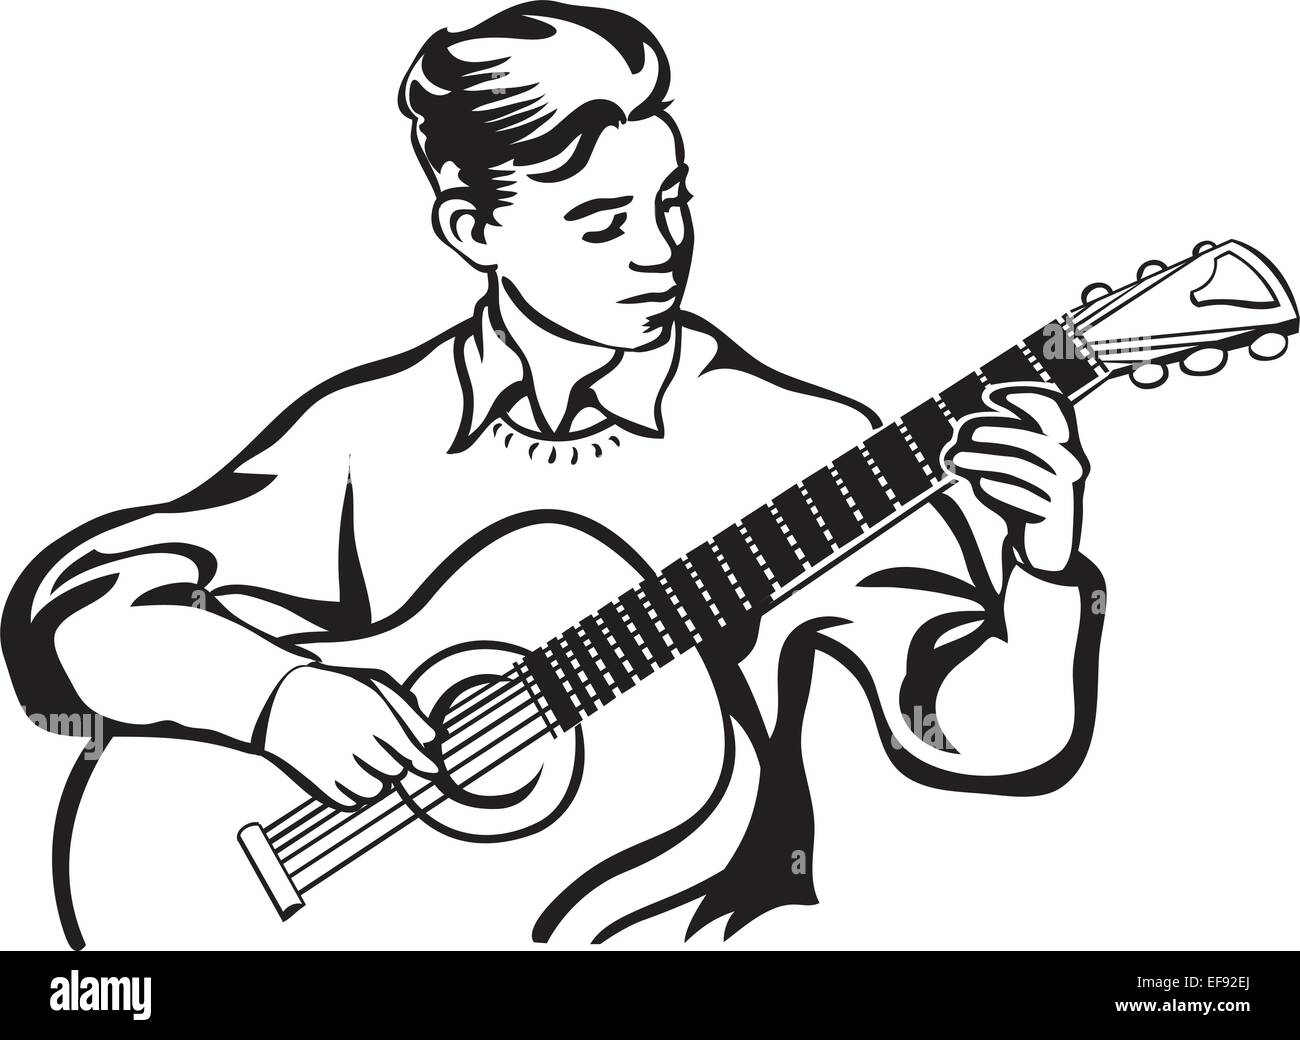 Acoustic Guitar Cartoon Clip Art Imágenes De Stock Acoustic Guitar